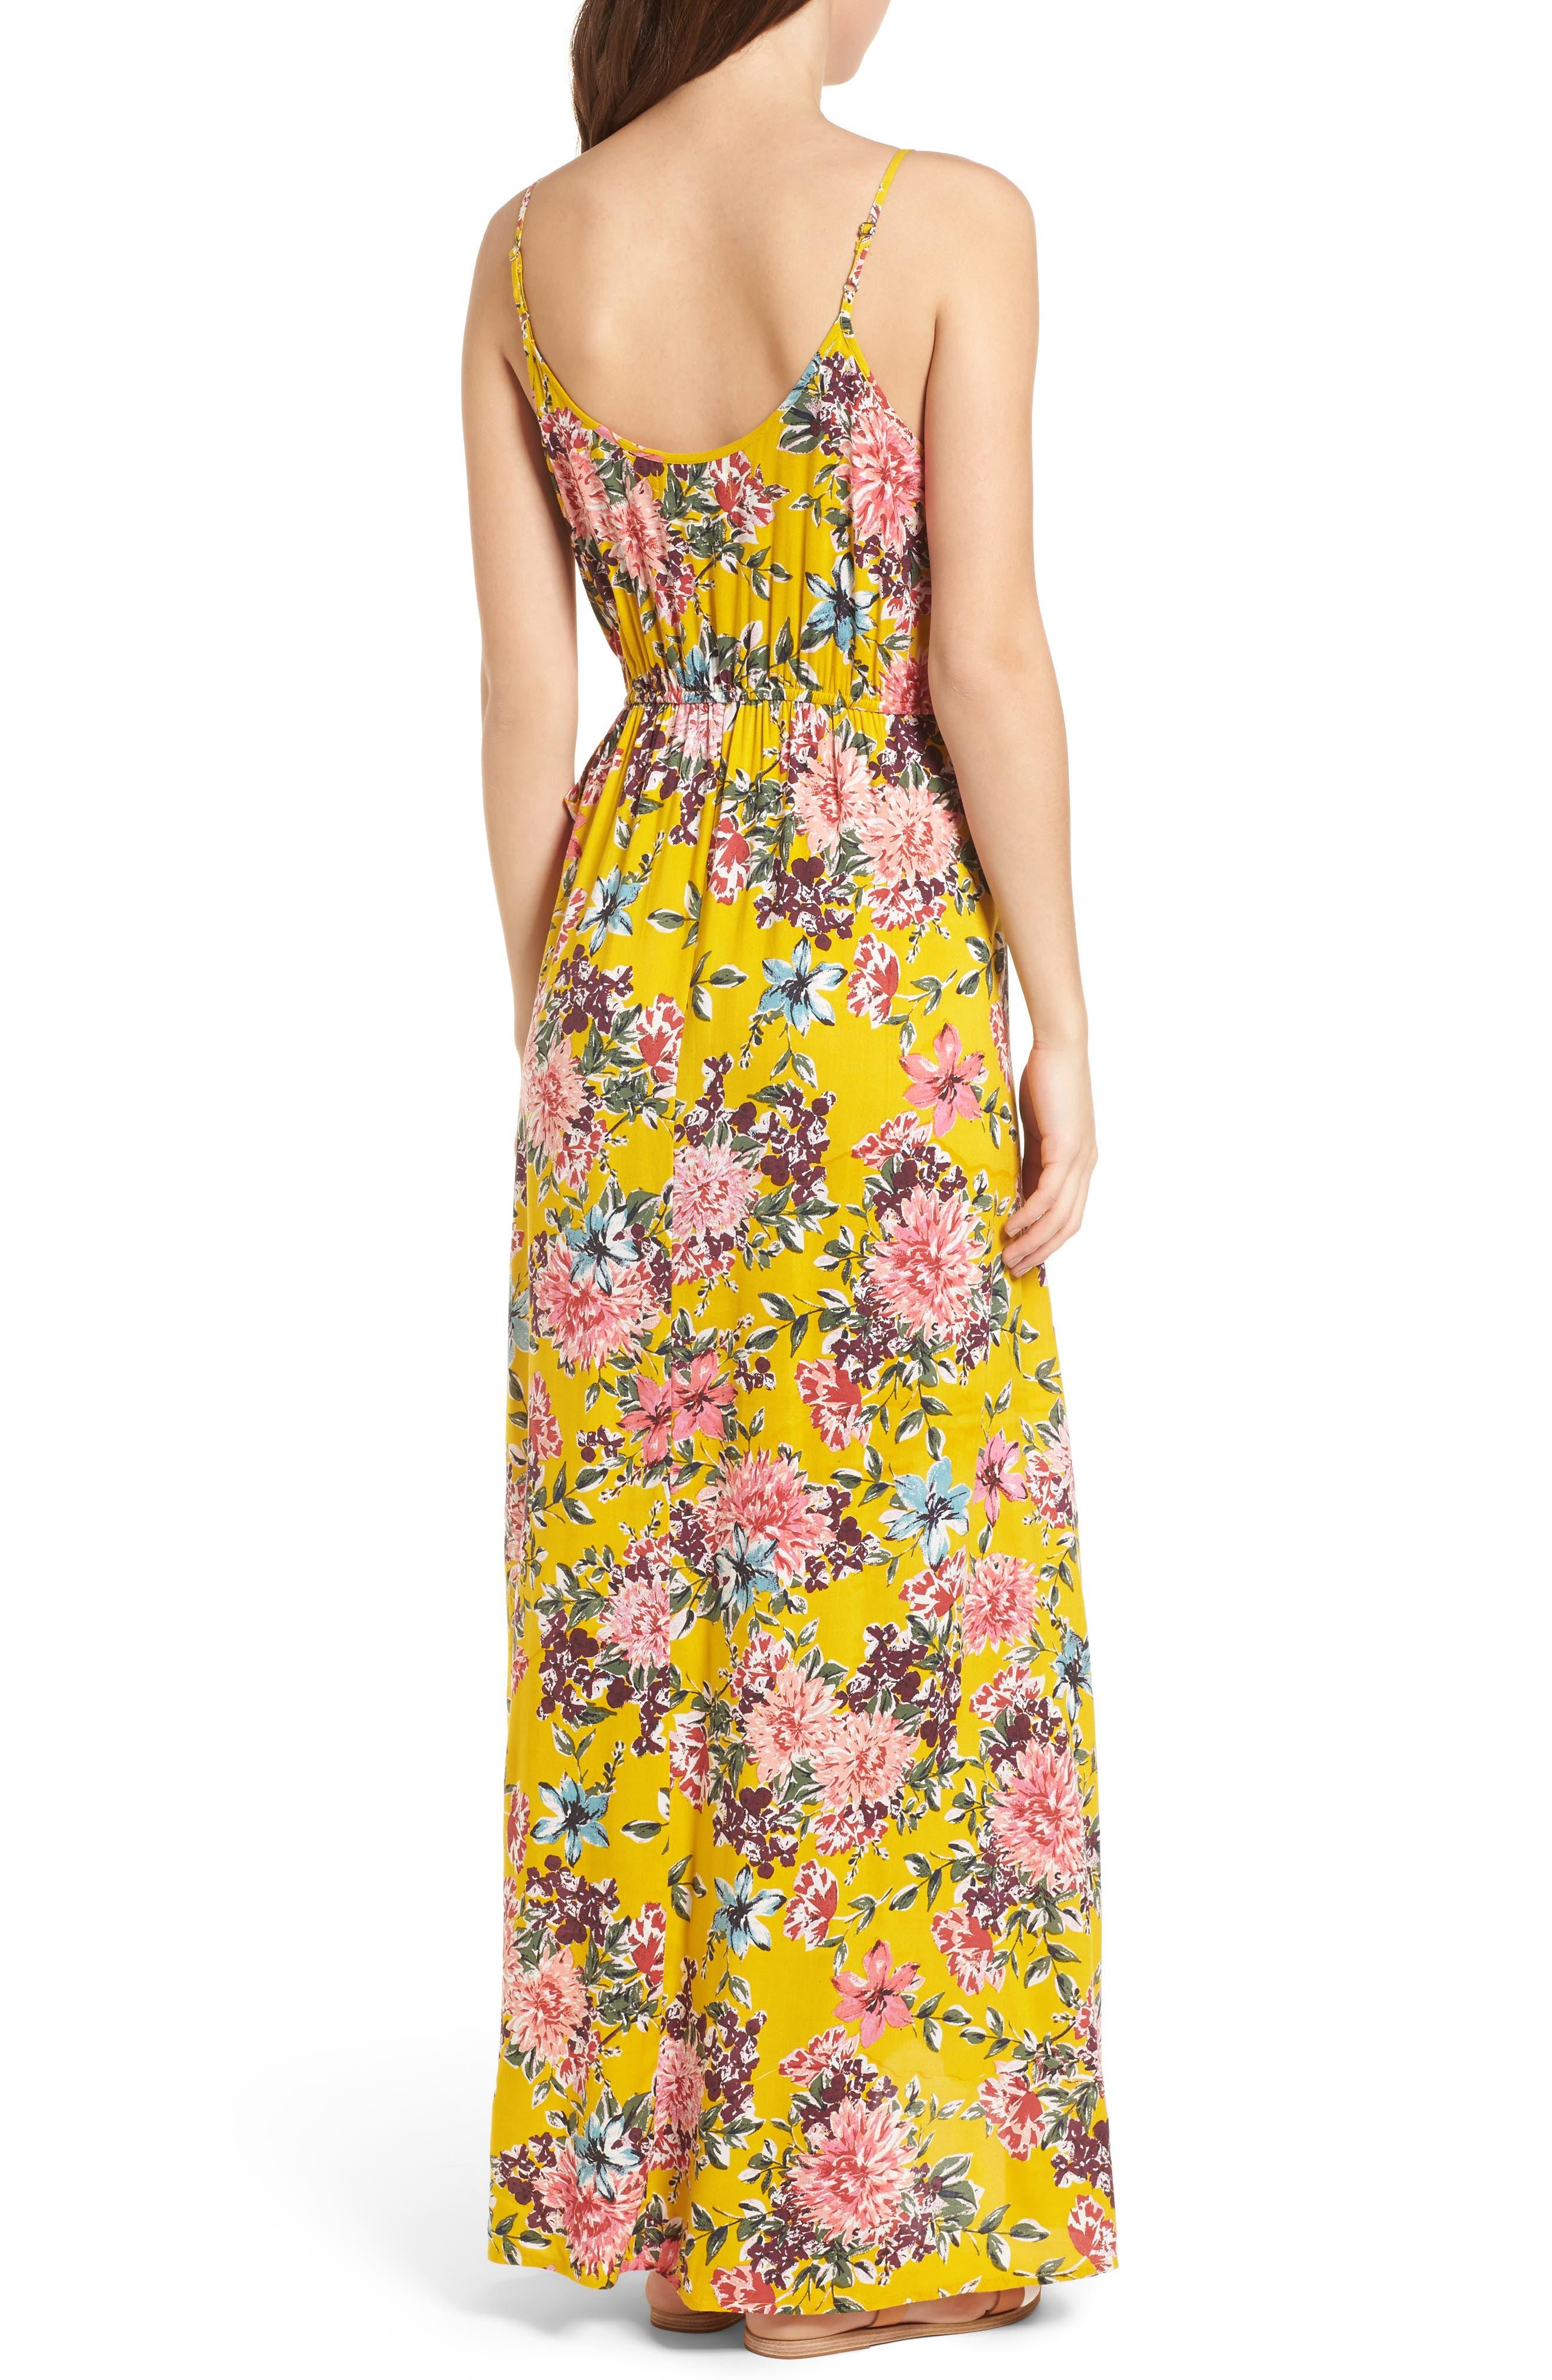 Chrysanthemum Wrap Front Dress,                             Alternate thumbnail 2, color,                             703